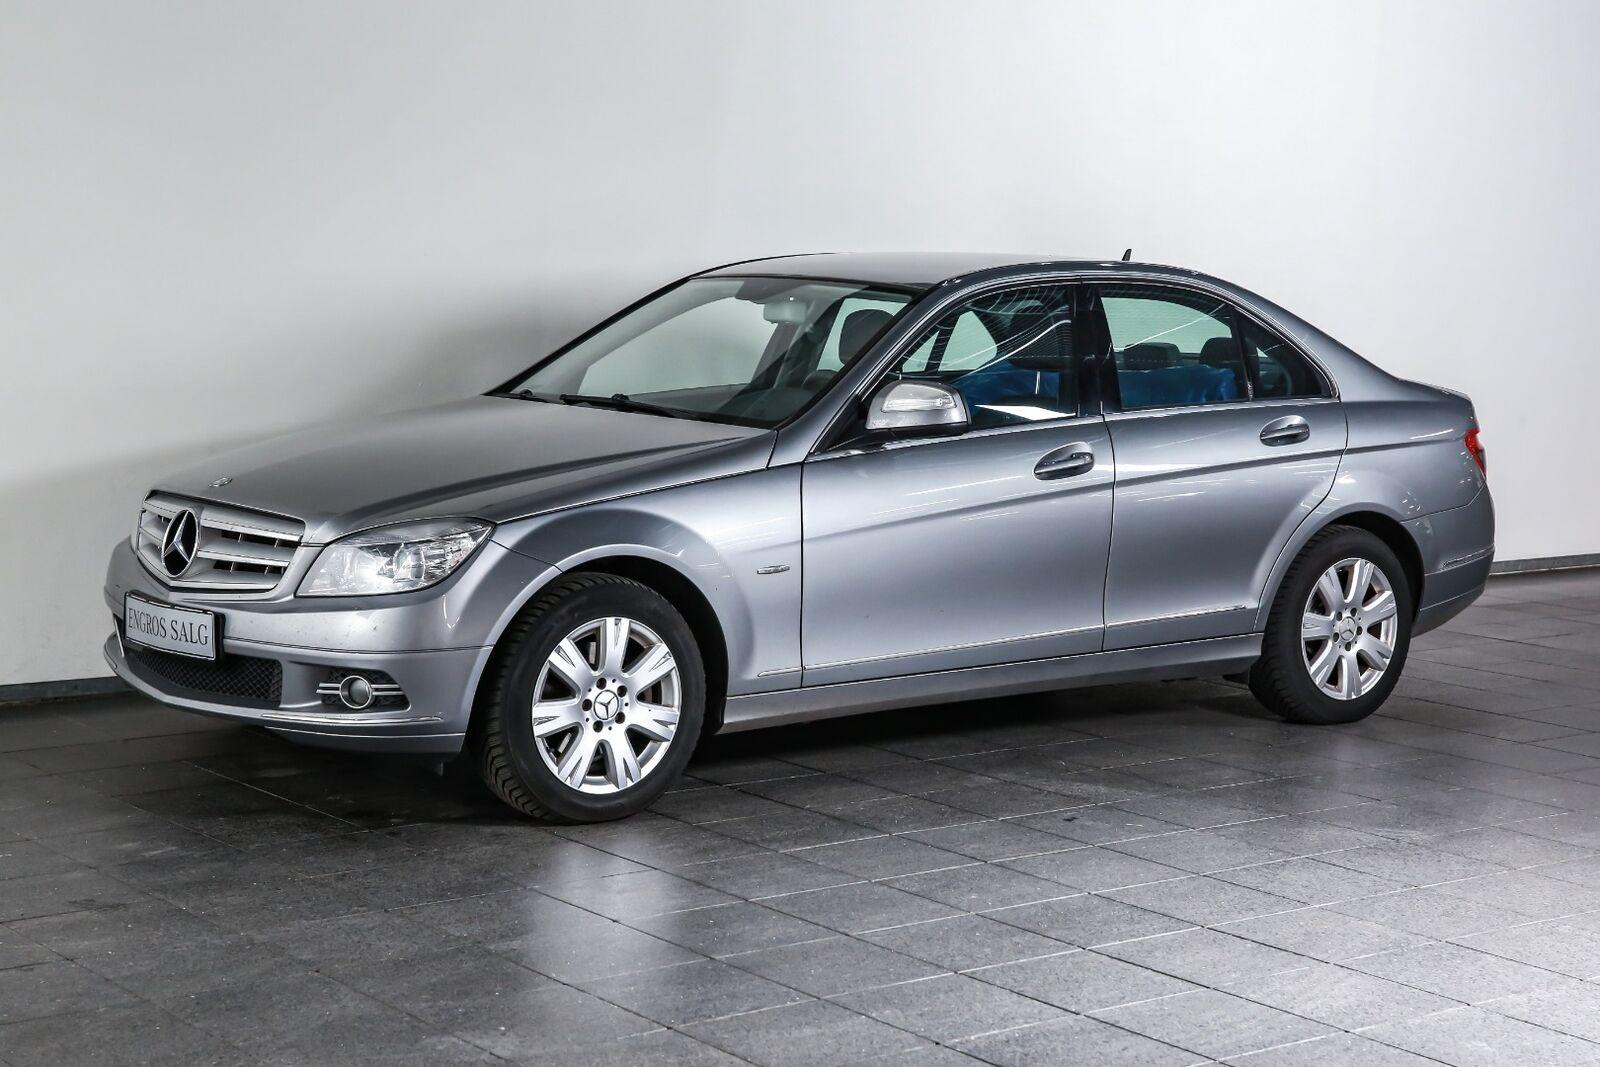 Mercedes-Benz C220 2,2 CDi Avantgarde aut.